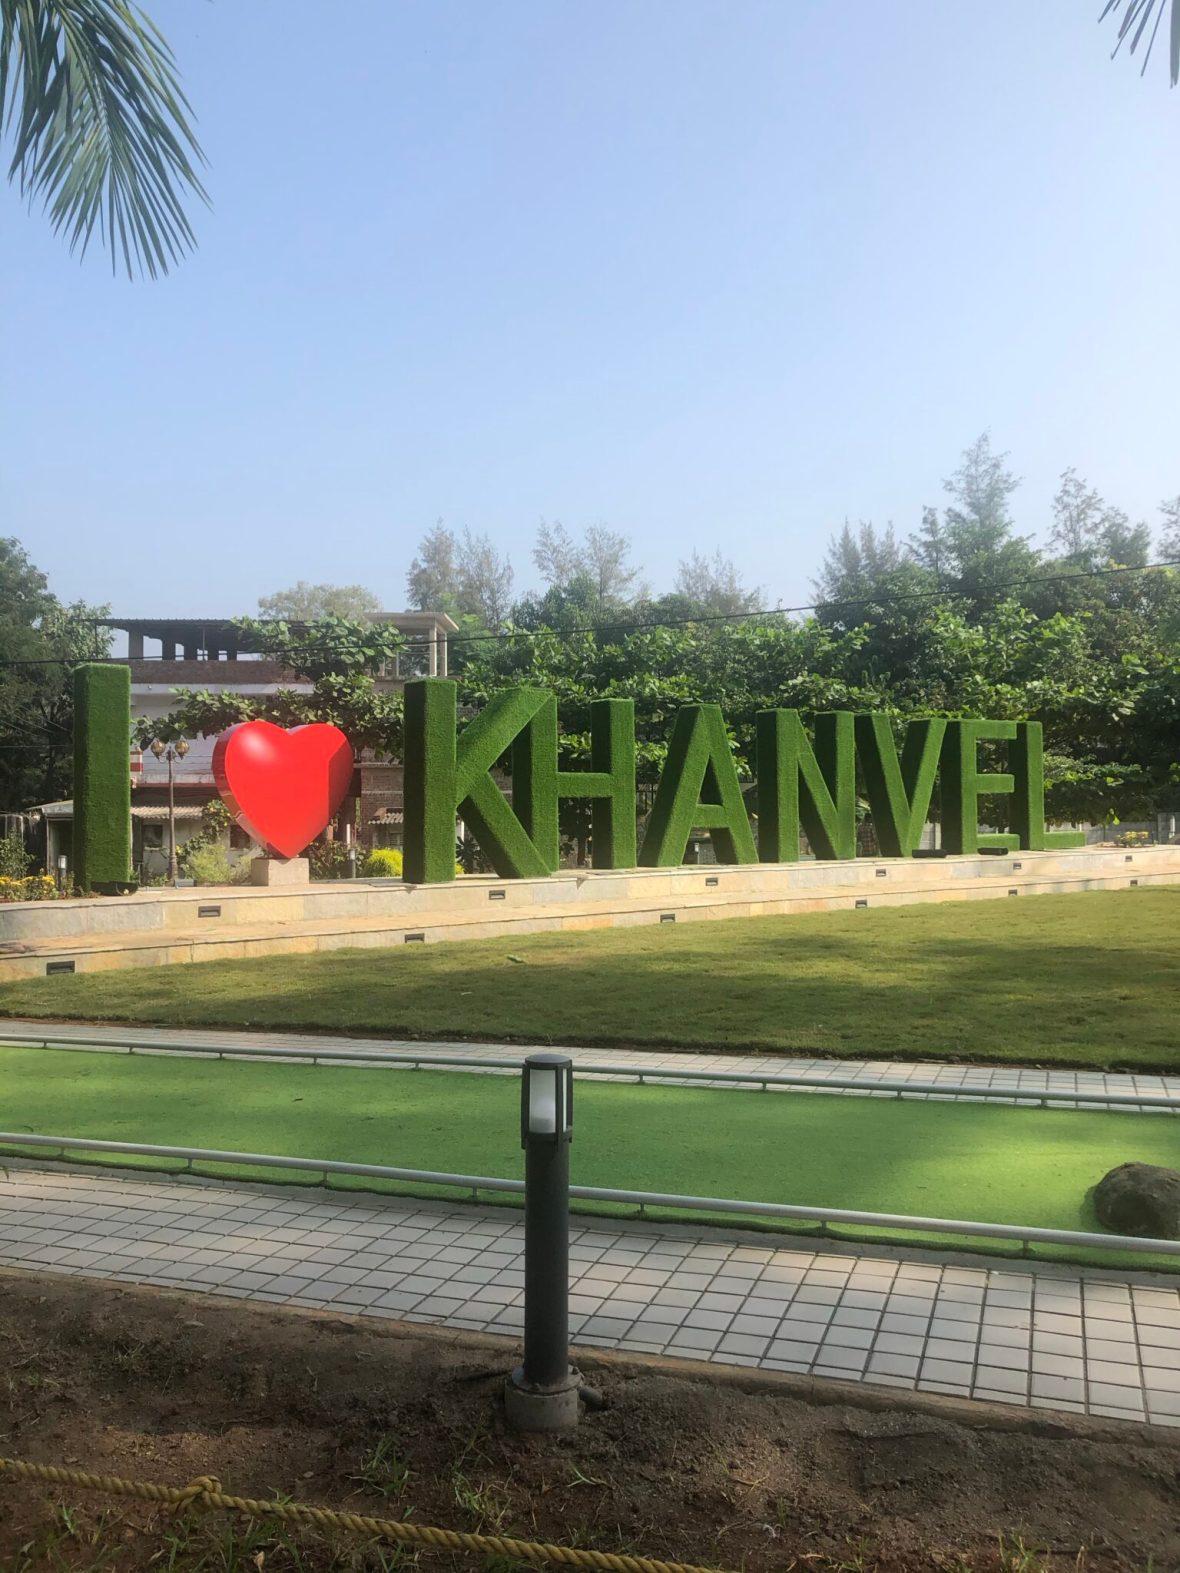 Khanvel resort